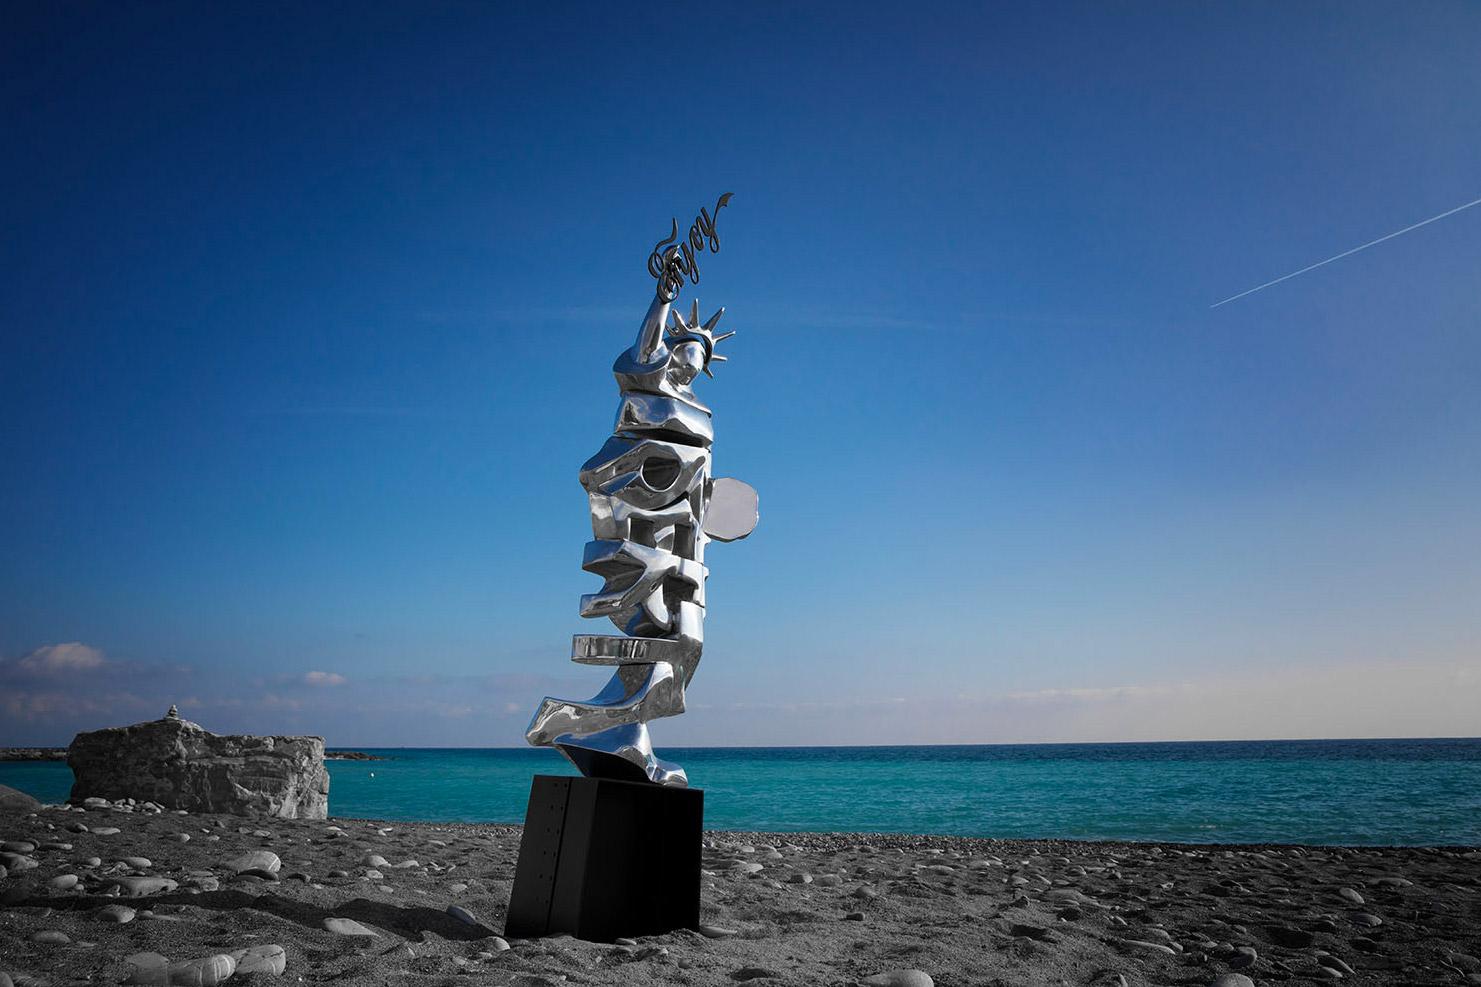 Liberty  (2010) | aluminium |245 x 55 x 45 cm | oeuvre originale | © Jean-Pierre Rey